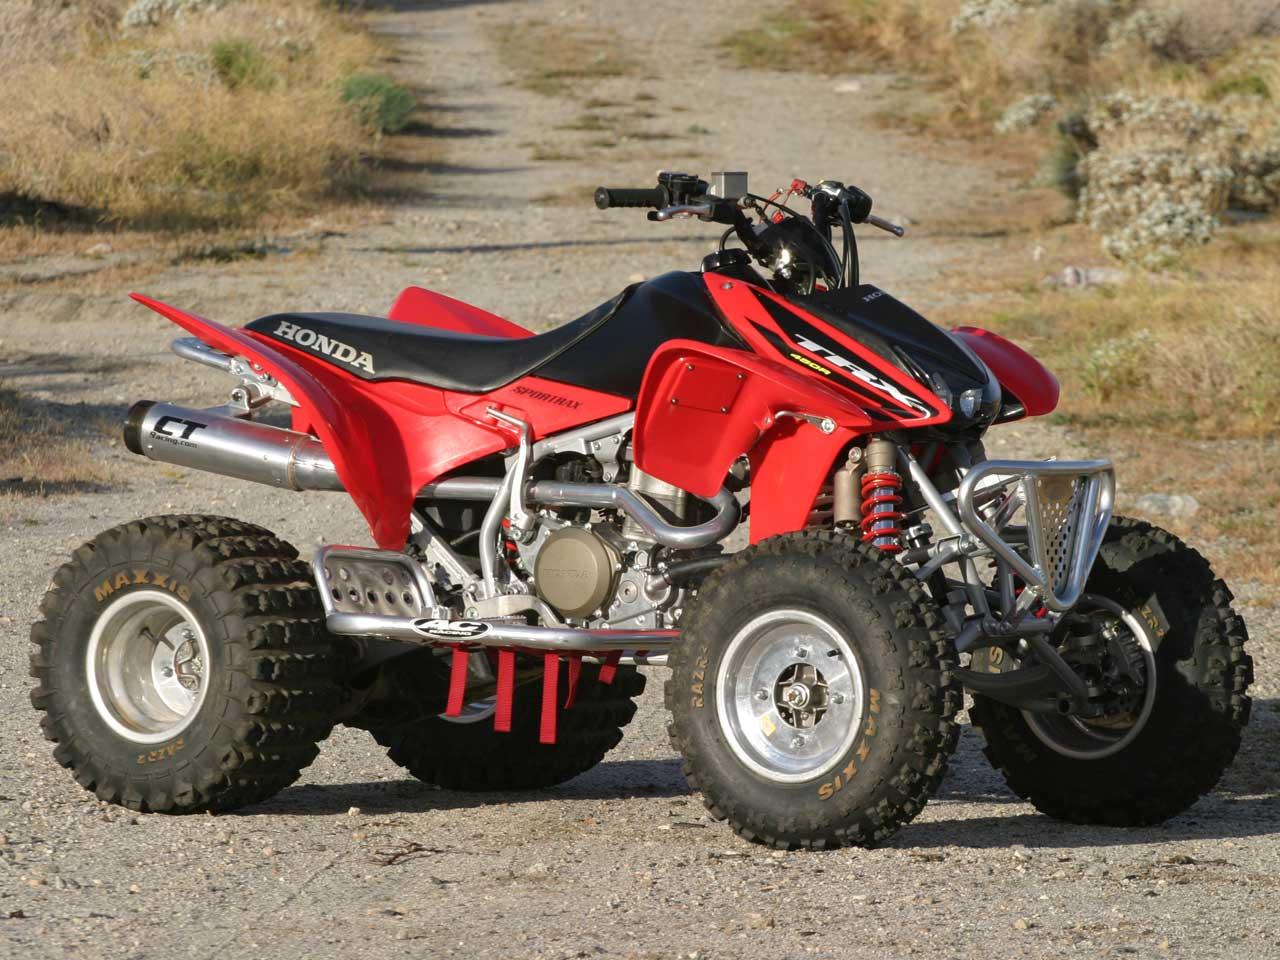 HONDA TRX 450 silver